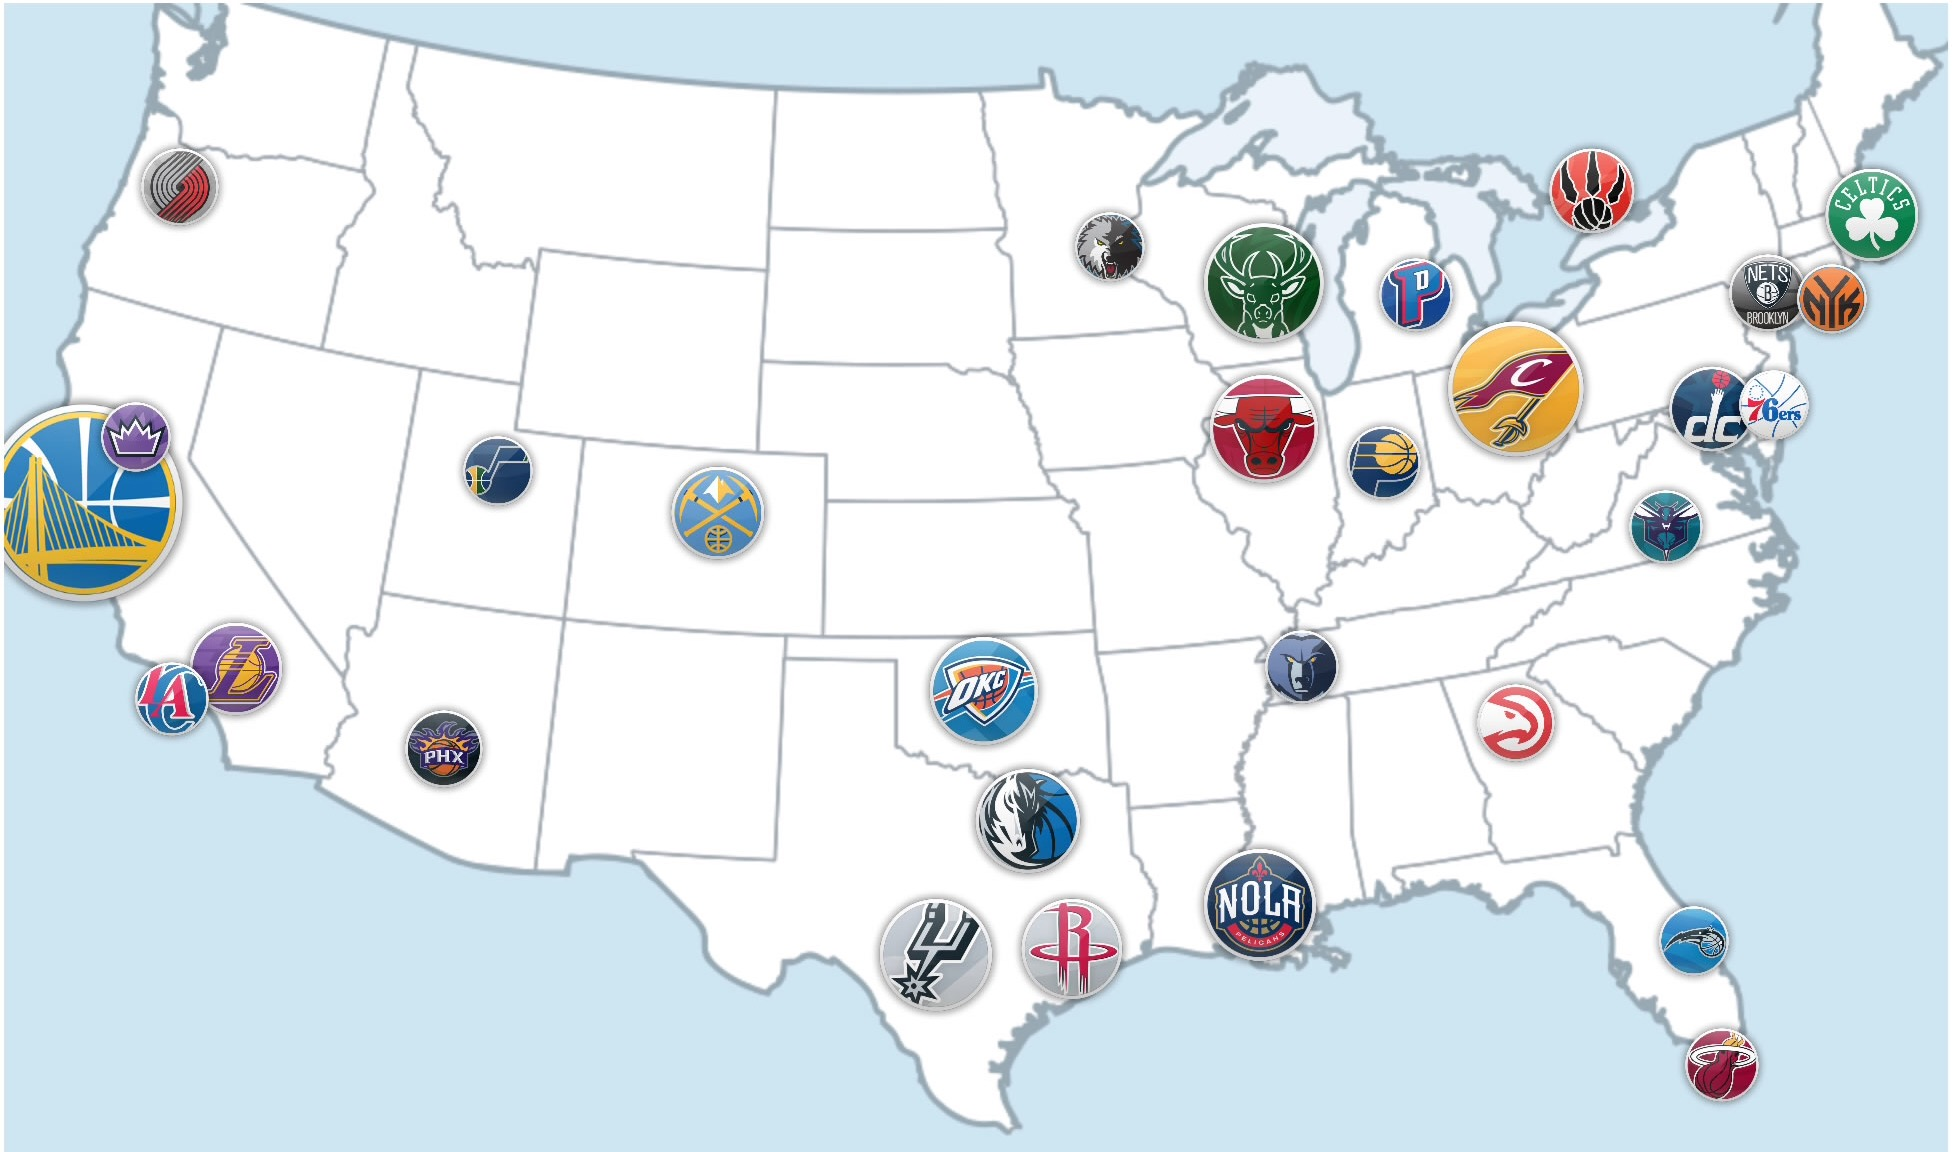 Similiar NBA Teams Map 2017 Keywords